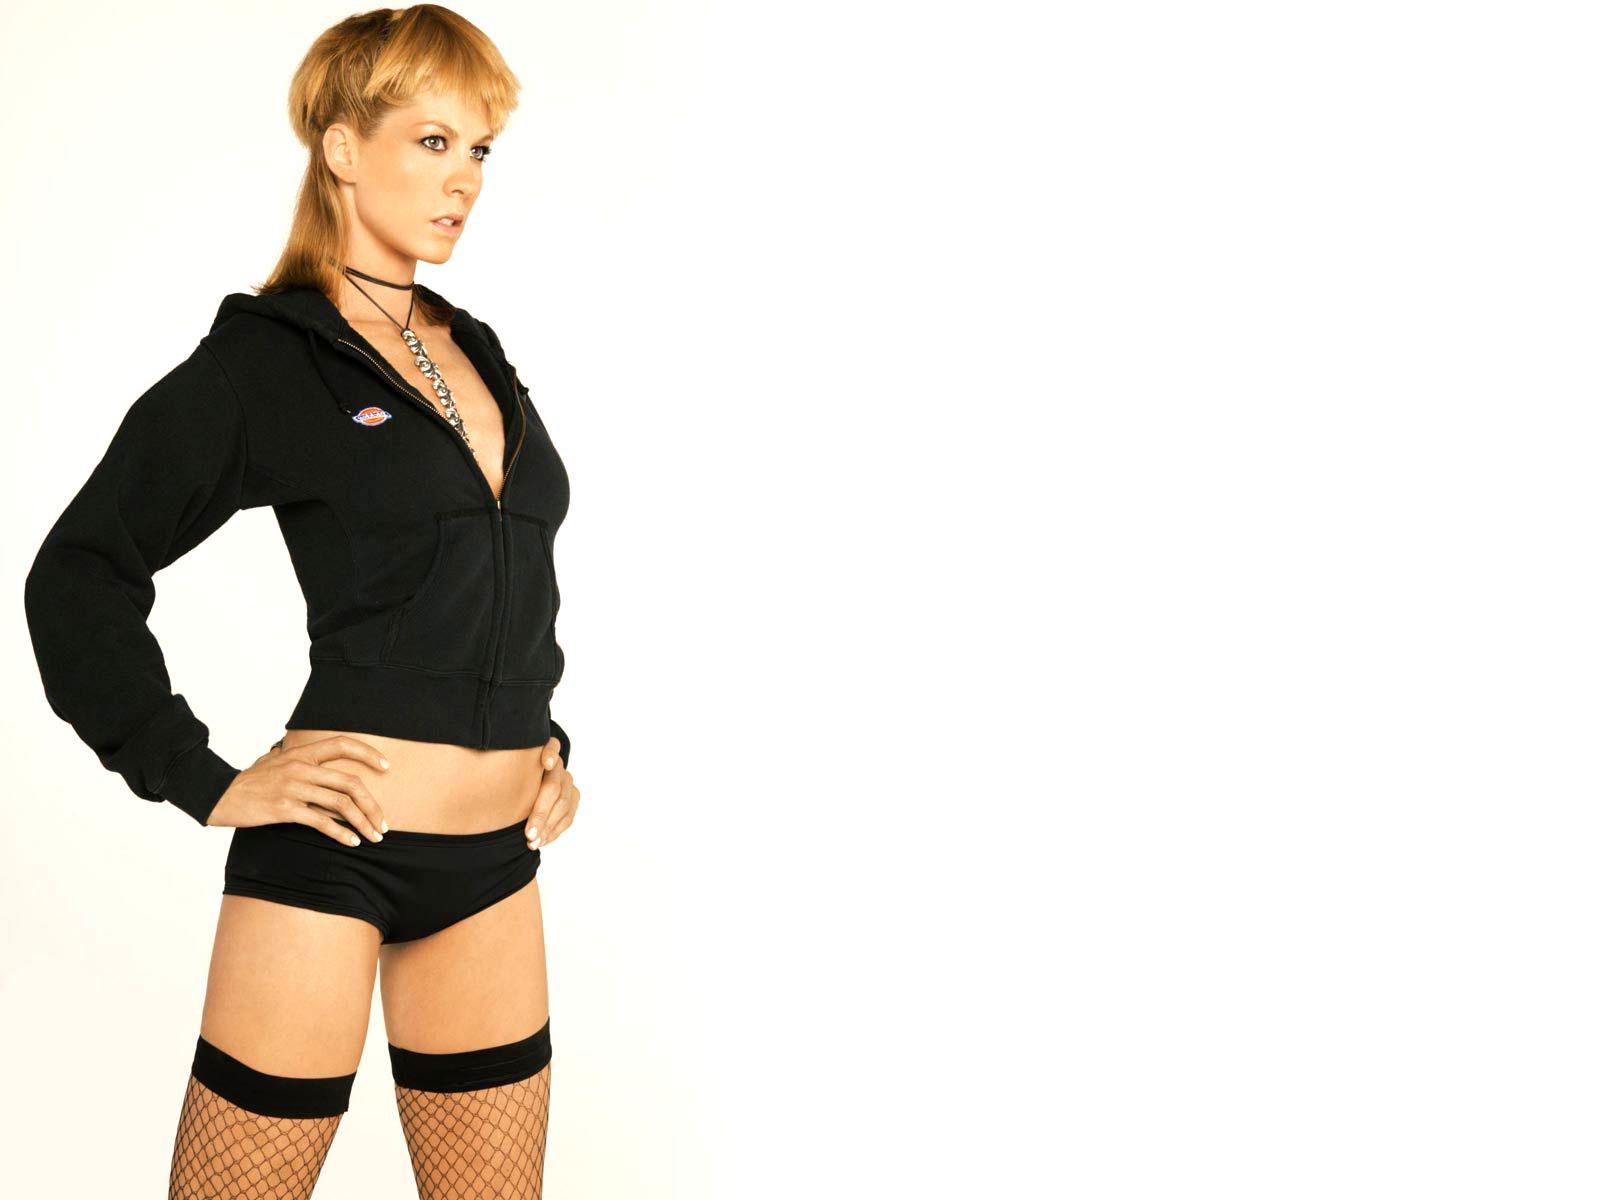 Jenna elfman wallpapers top sexy women